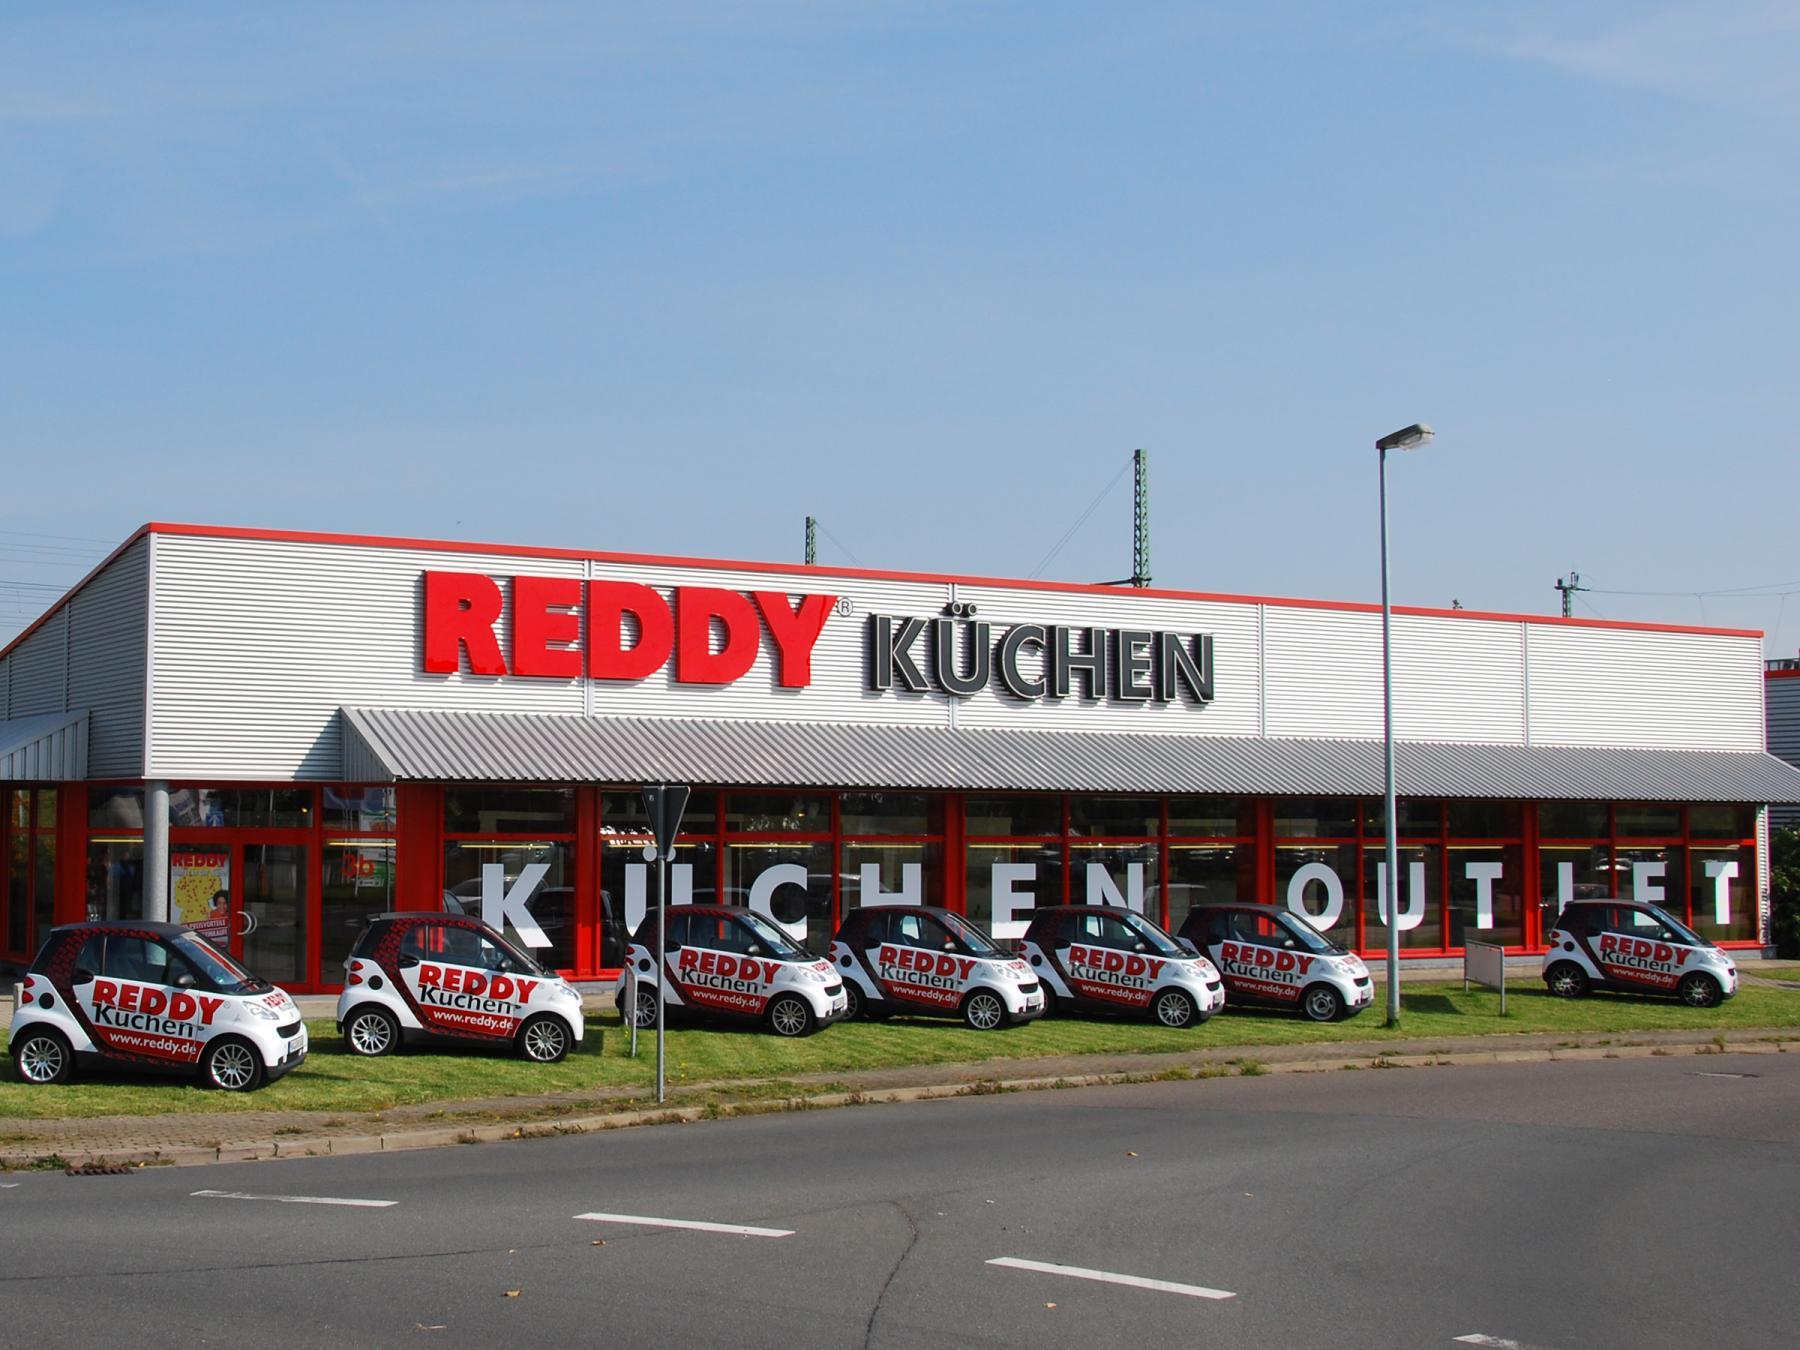 Fantastisch Reddy Küchen Trier Fotos - Heimat Ideen ...